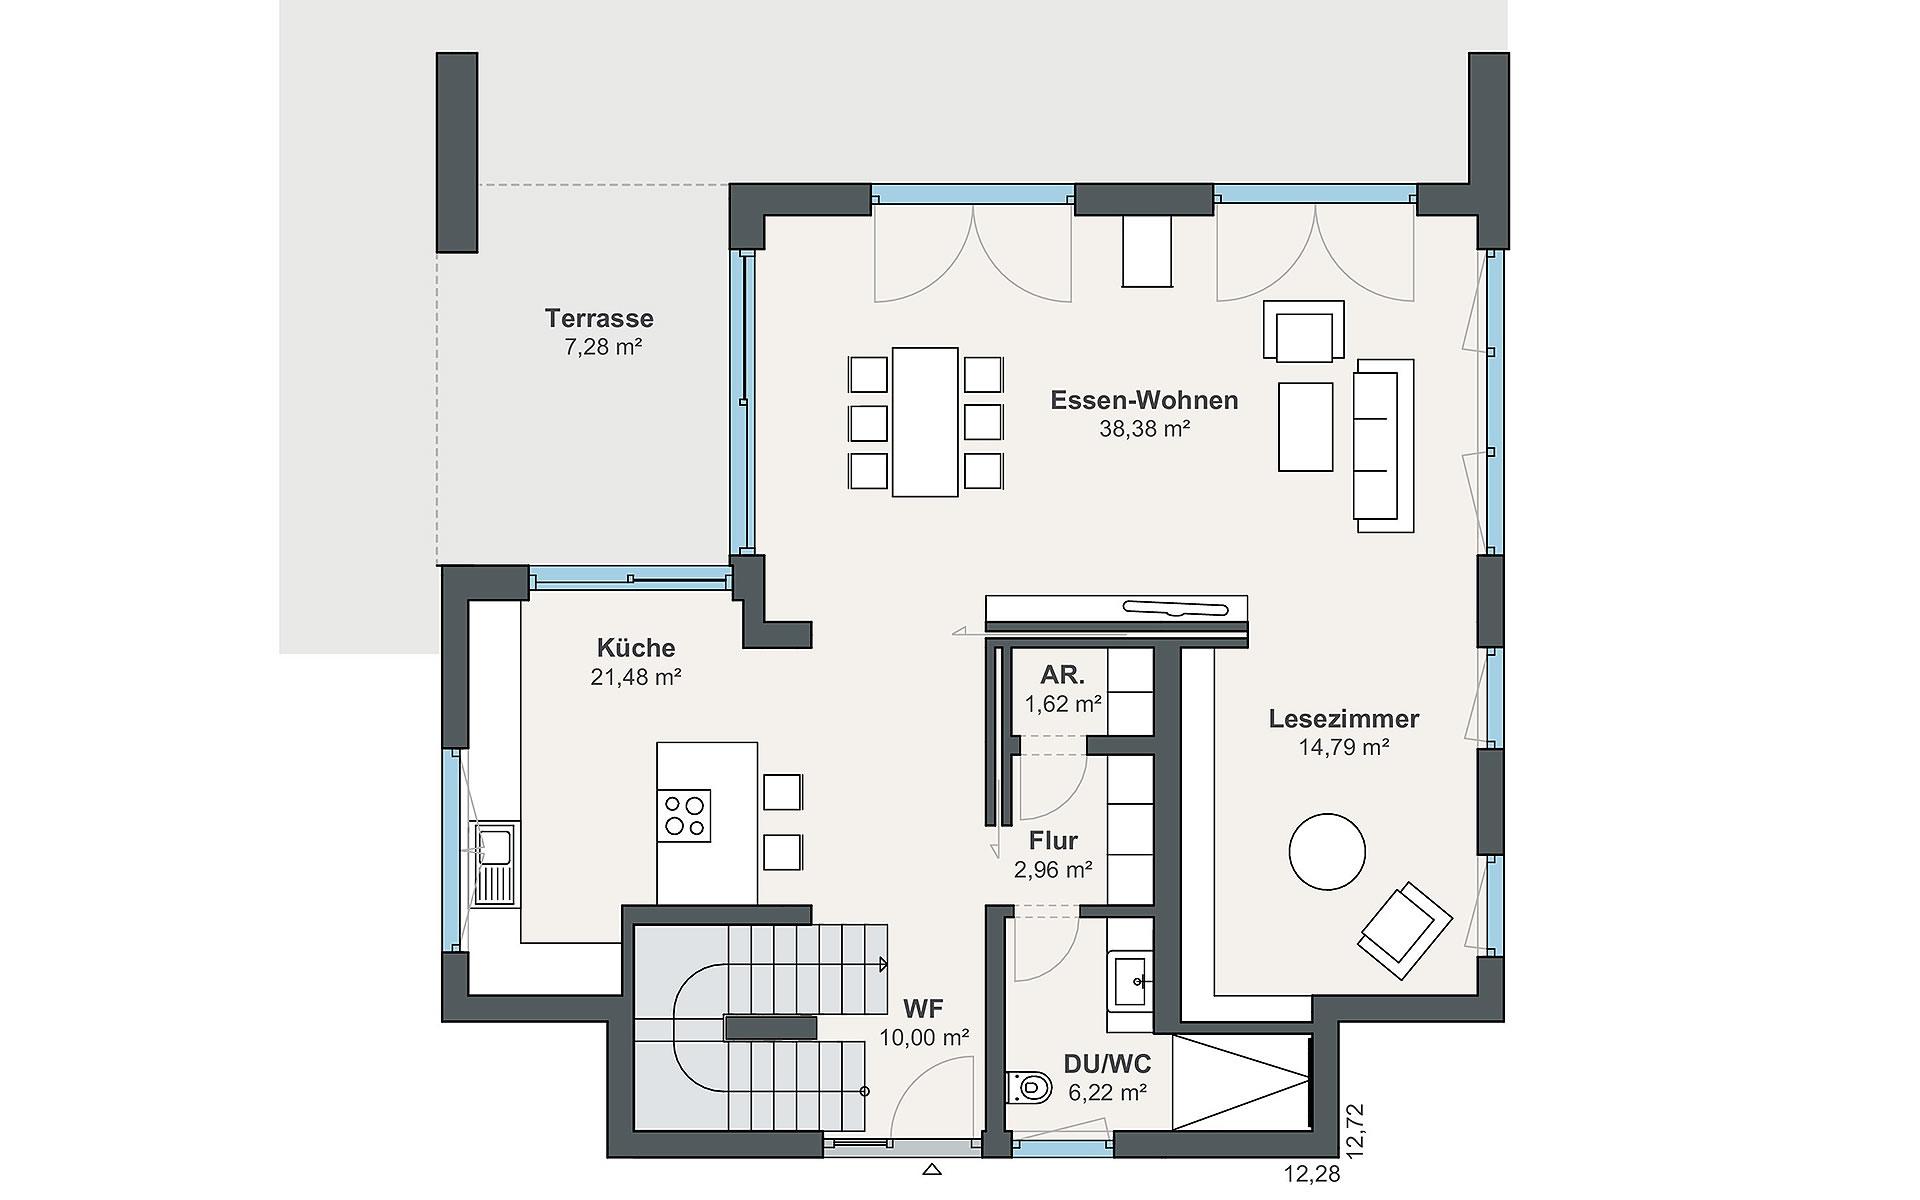 Erdgeschoss Jubiläumshaus (AH Rheinau-Linx) von WeberHaus GmbH & Co. KG